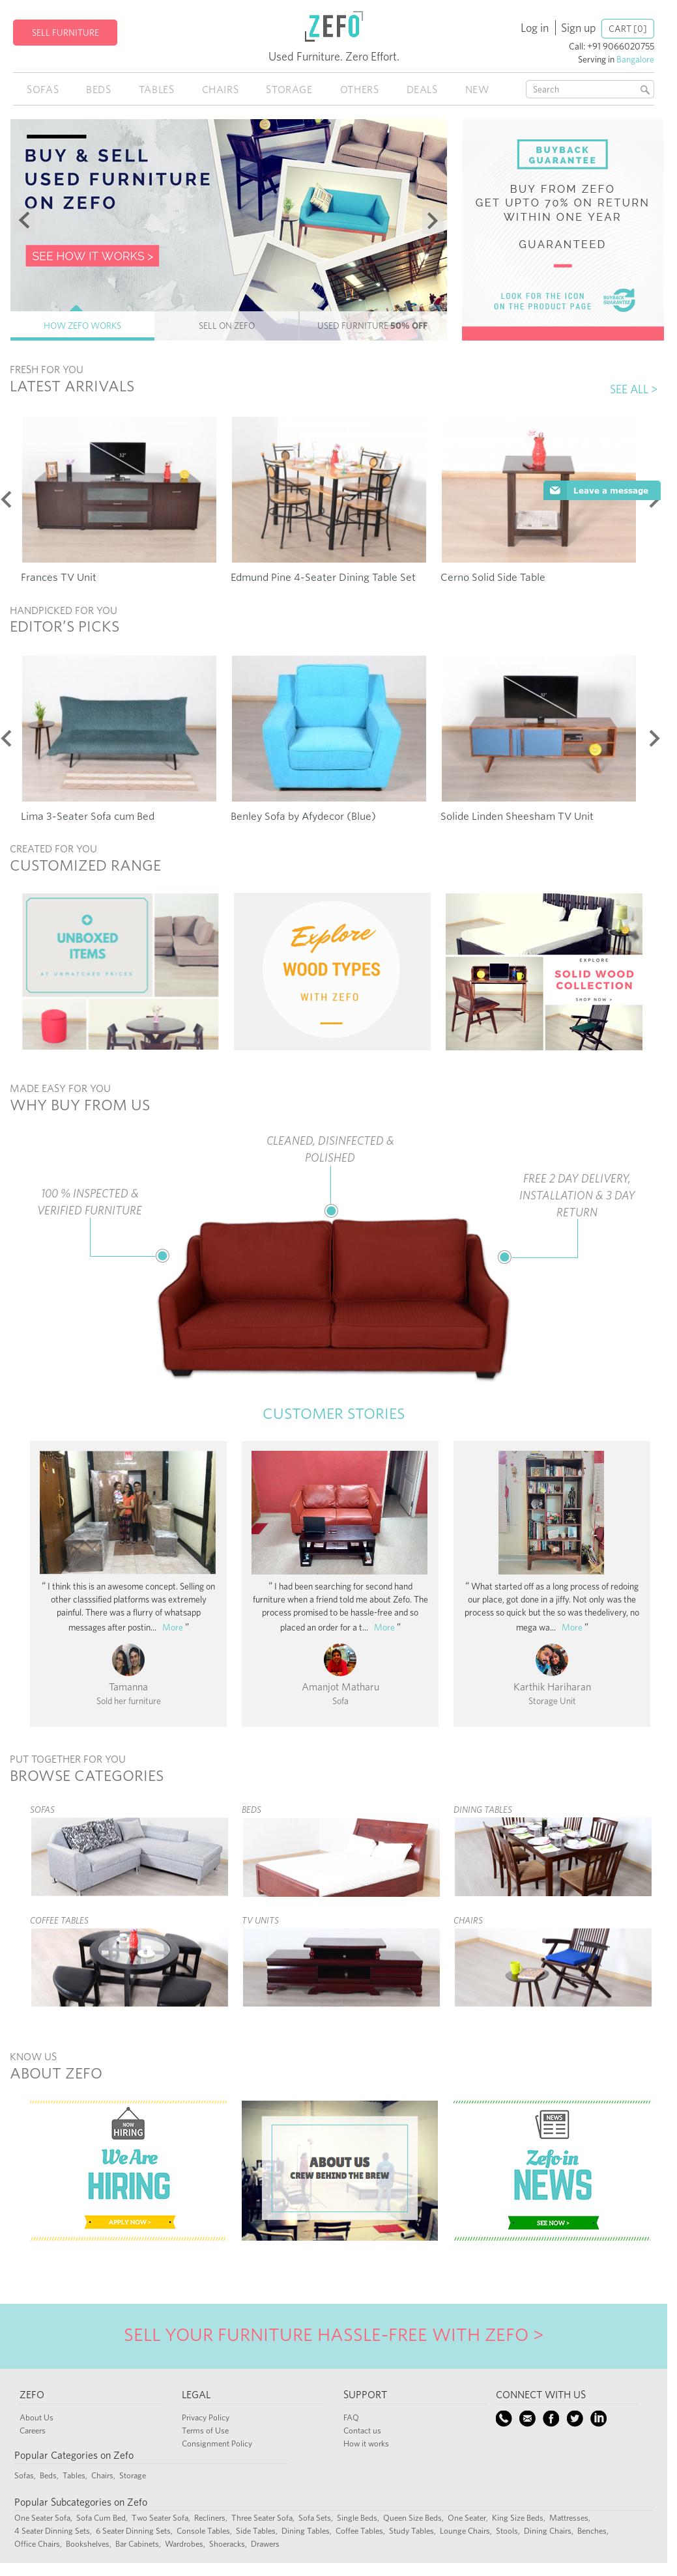 Astonishing Owler Reports Zefo Furniture Portal Gozefo Revamps Theyellowbook Wood Chair Design Ideas Theyellowbookinfo